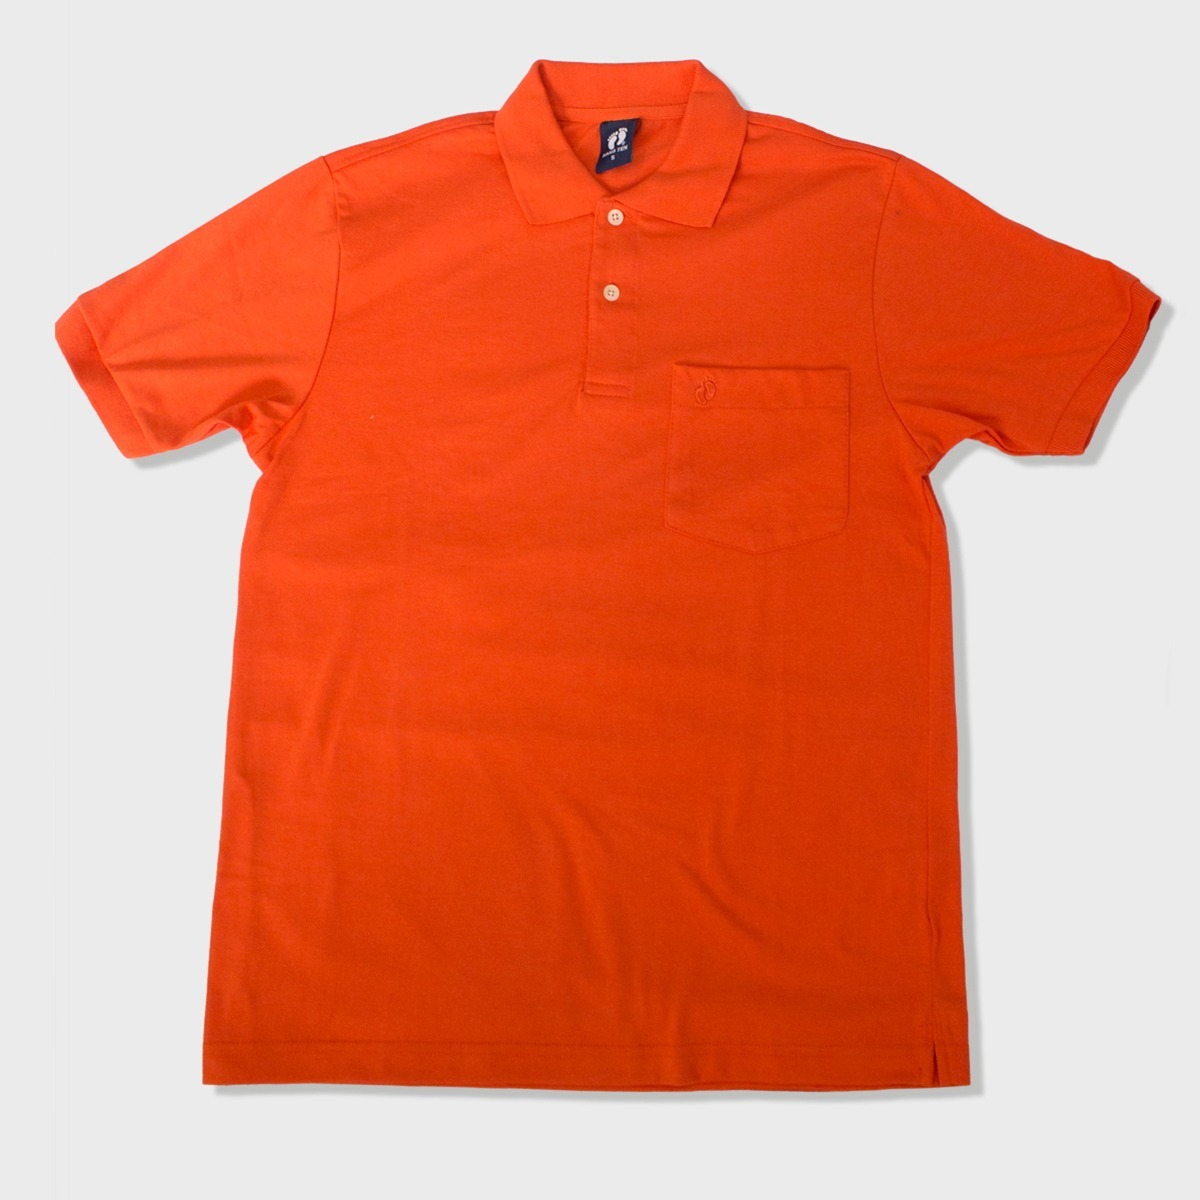 Camiseta Manga Corta Cuello Tipo Polo Color Anaranjado -   48.743 en ... c6f29cbc01184